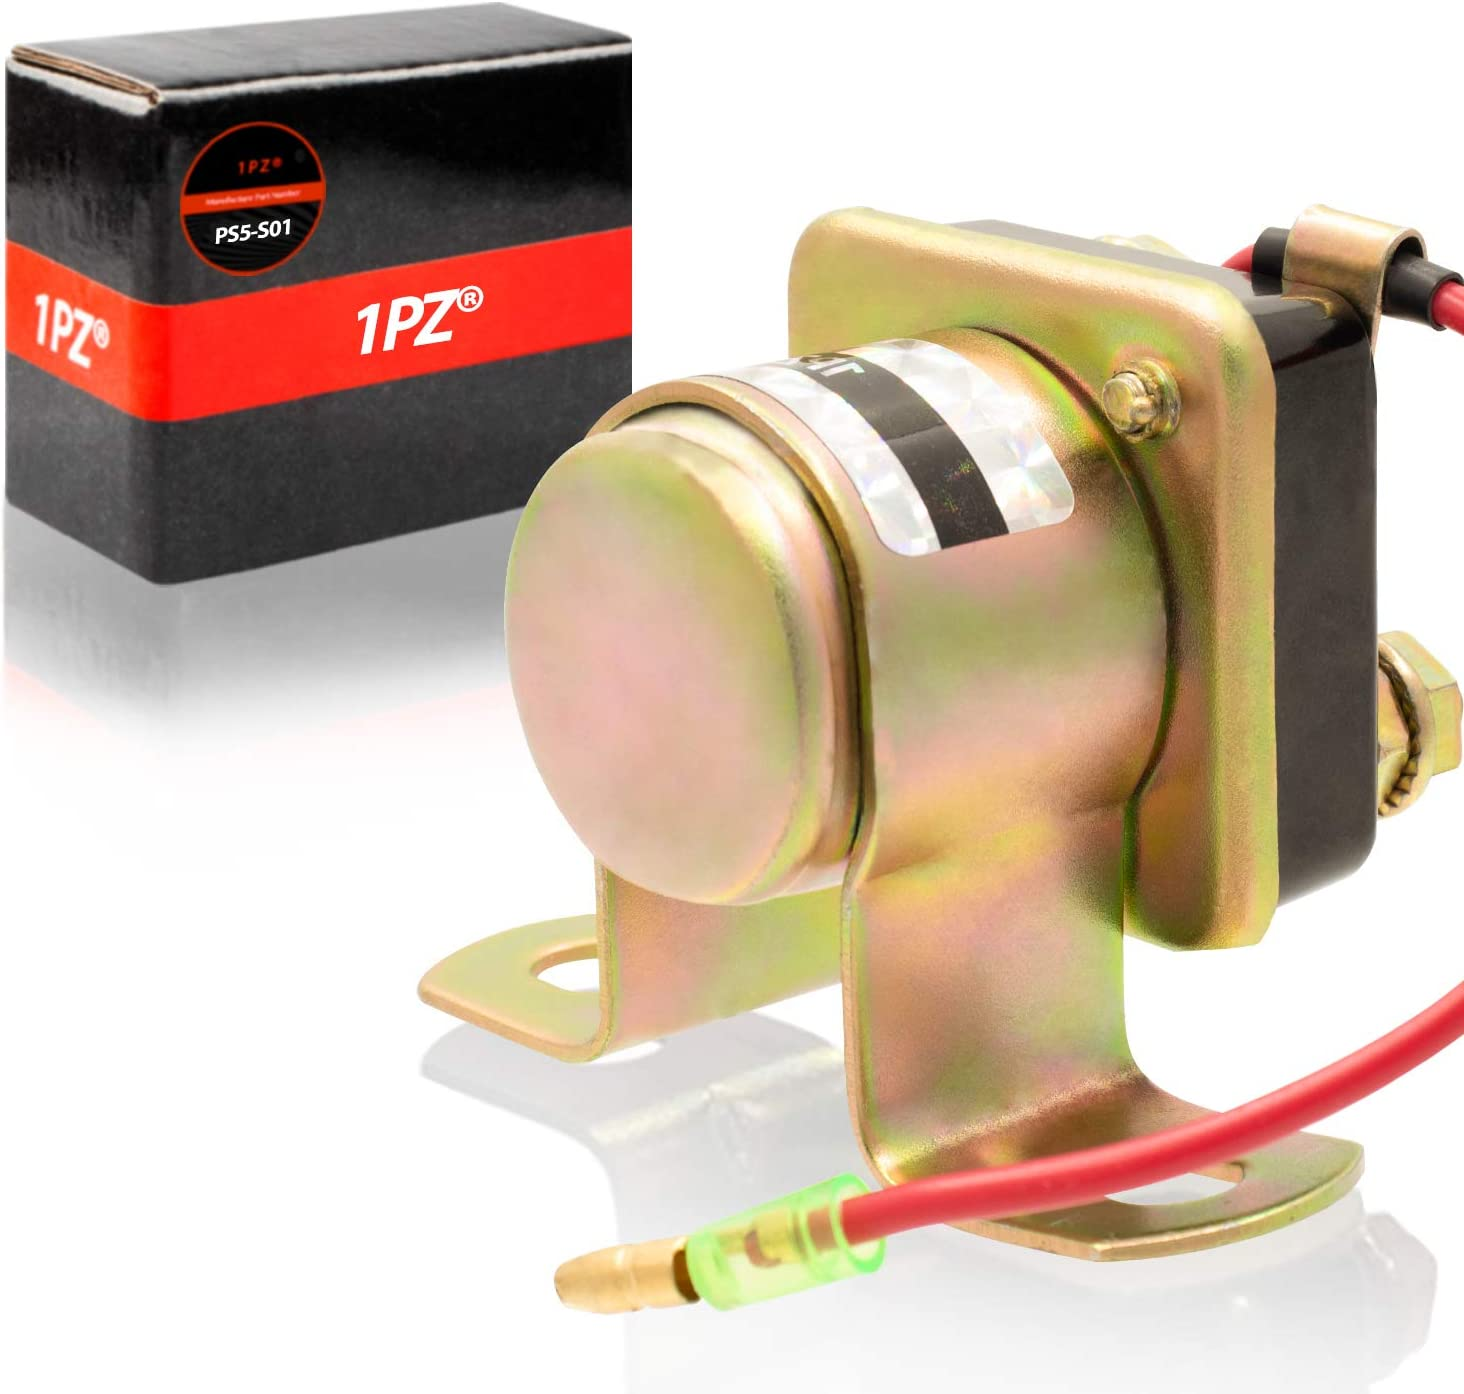 1PZ PS5-S01 Starter Solenoid Relay for POLARIS SPORTSMAN 500 600 1996-2004//SPORTSMAN 400L 4X4 1993-1997//TRAIL BOSS 250 325 1985-2002//TRAIL BLAZER 250//XPLORER 400 1996-2002//MAGNUM 325 425 500 1995-2002